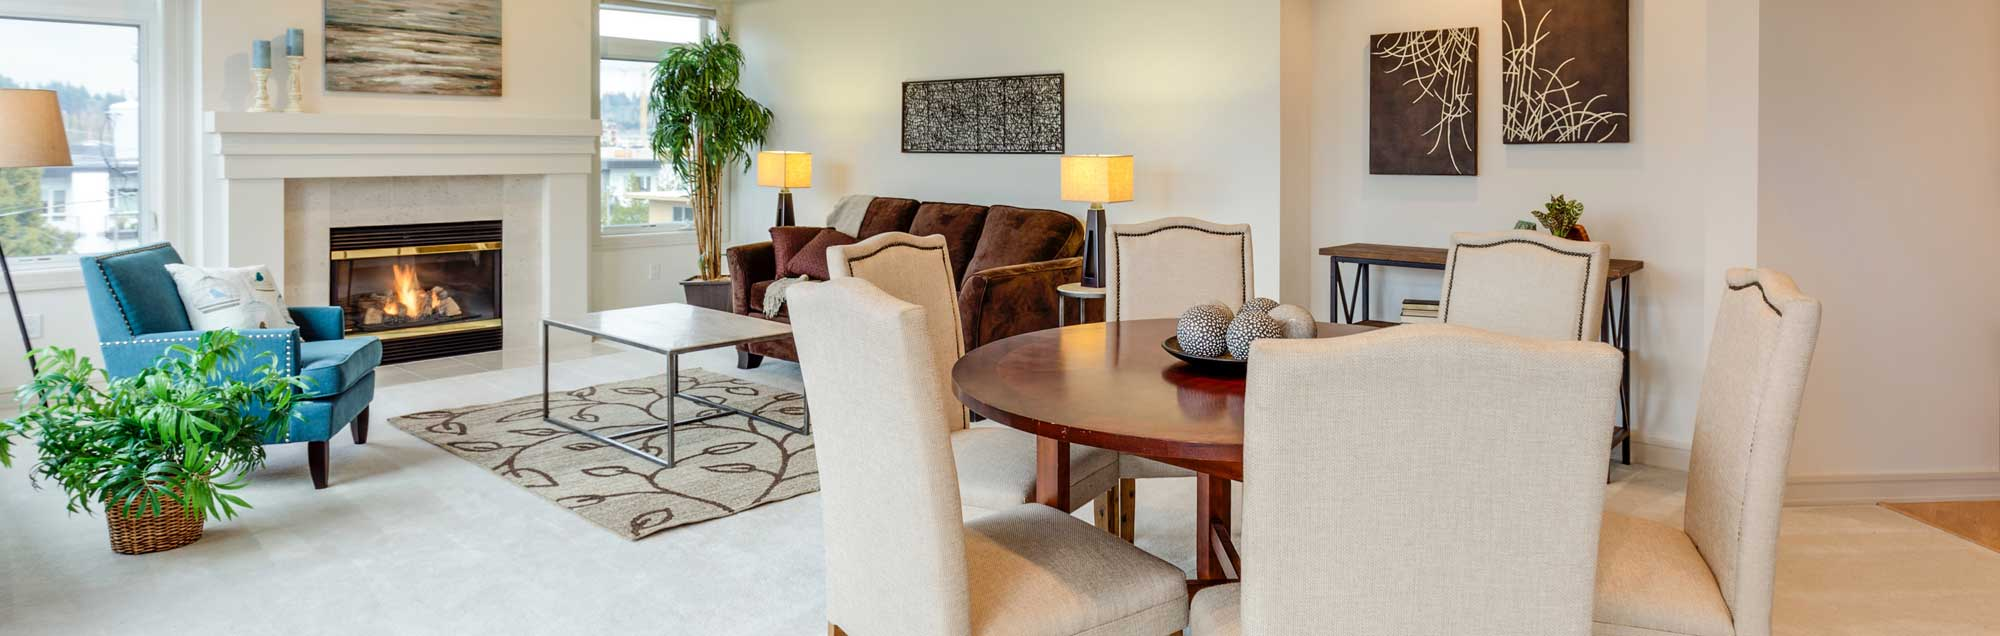 Living Dining Area Fireplace Sofa Windows Clean Carpet